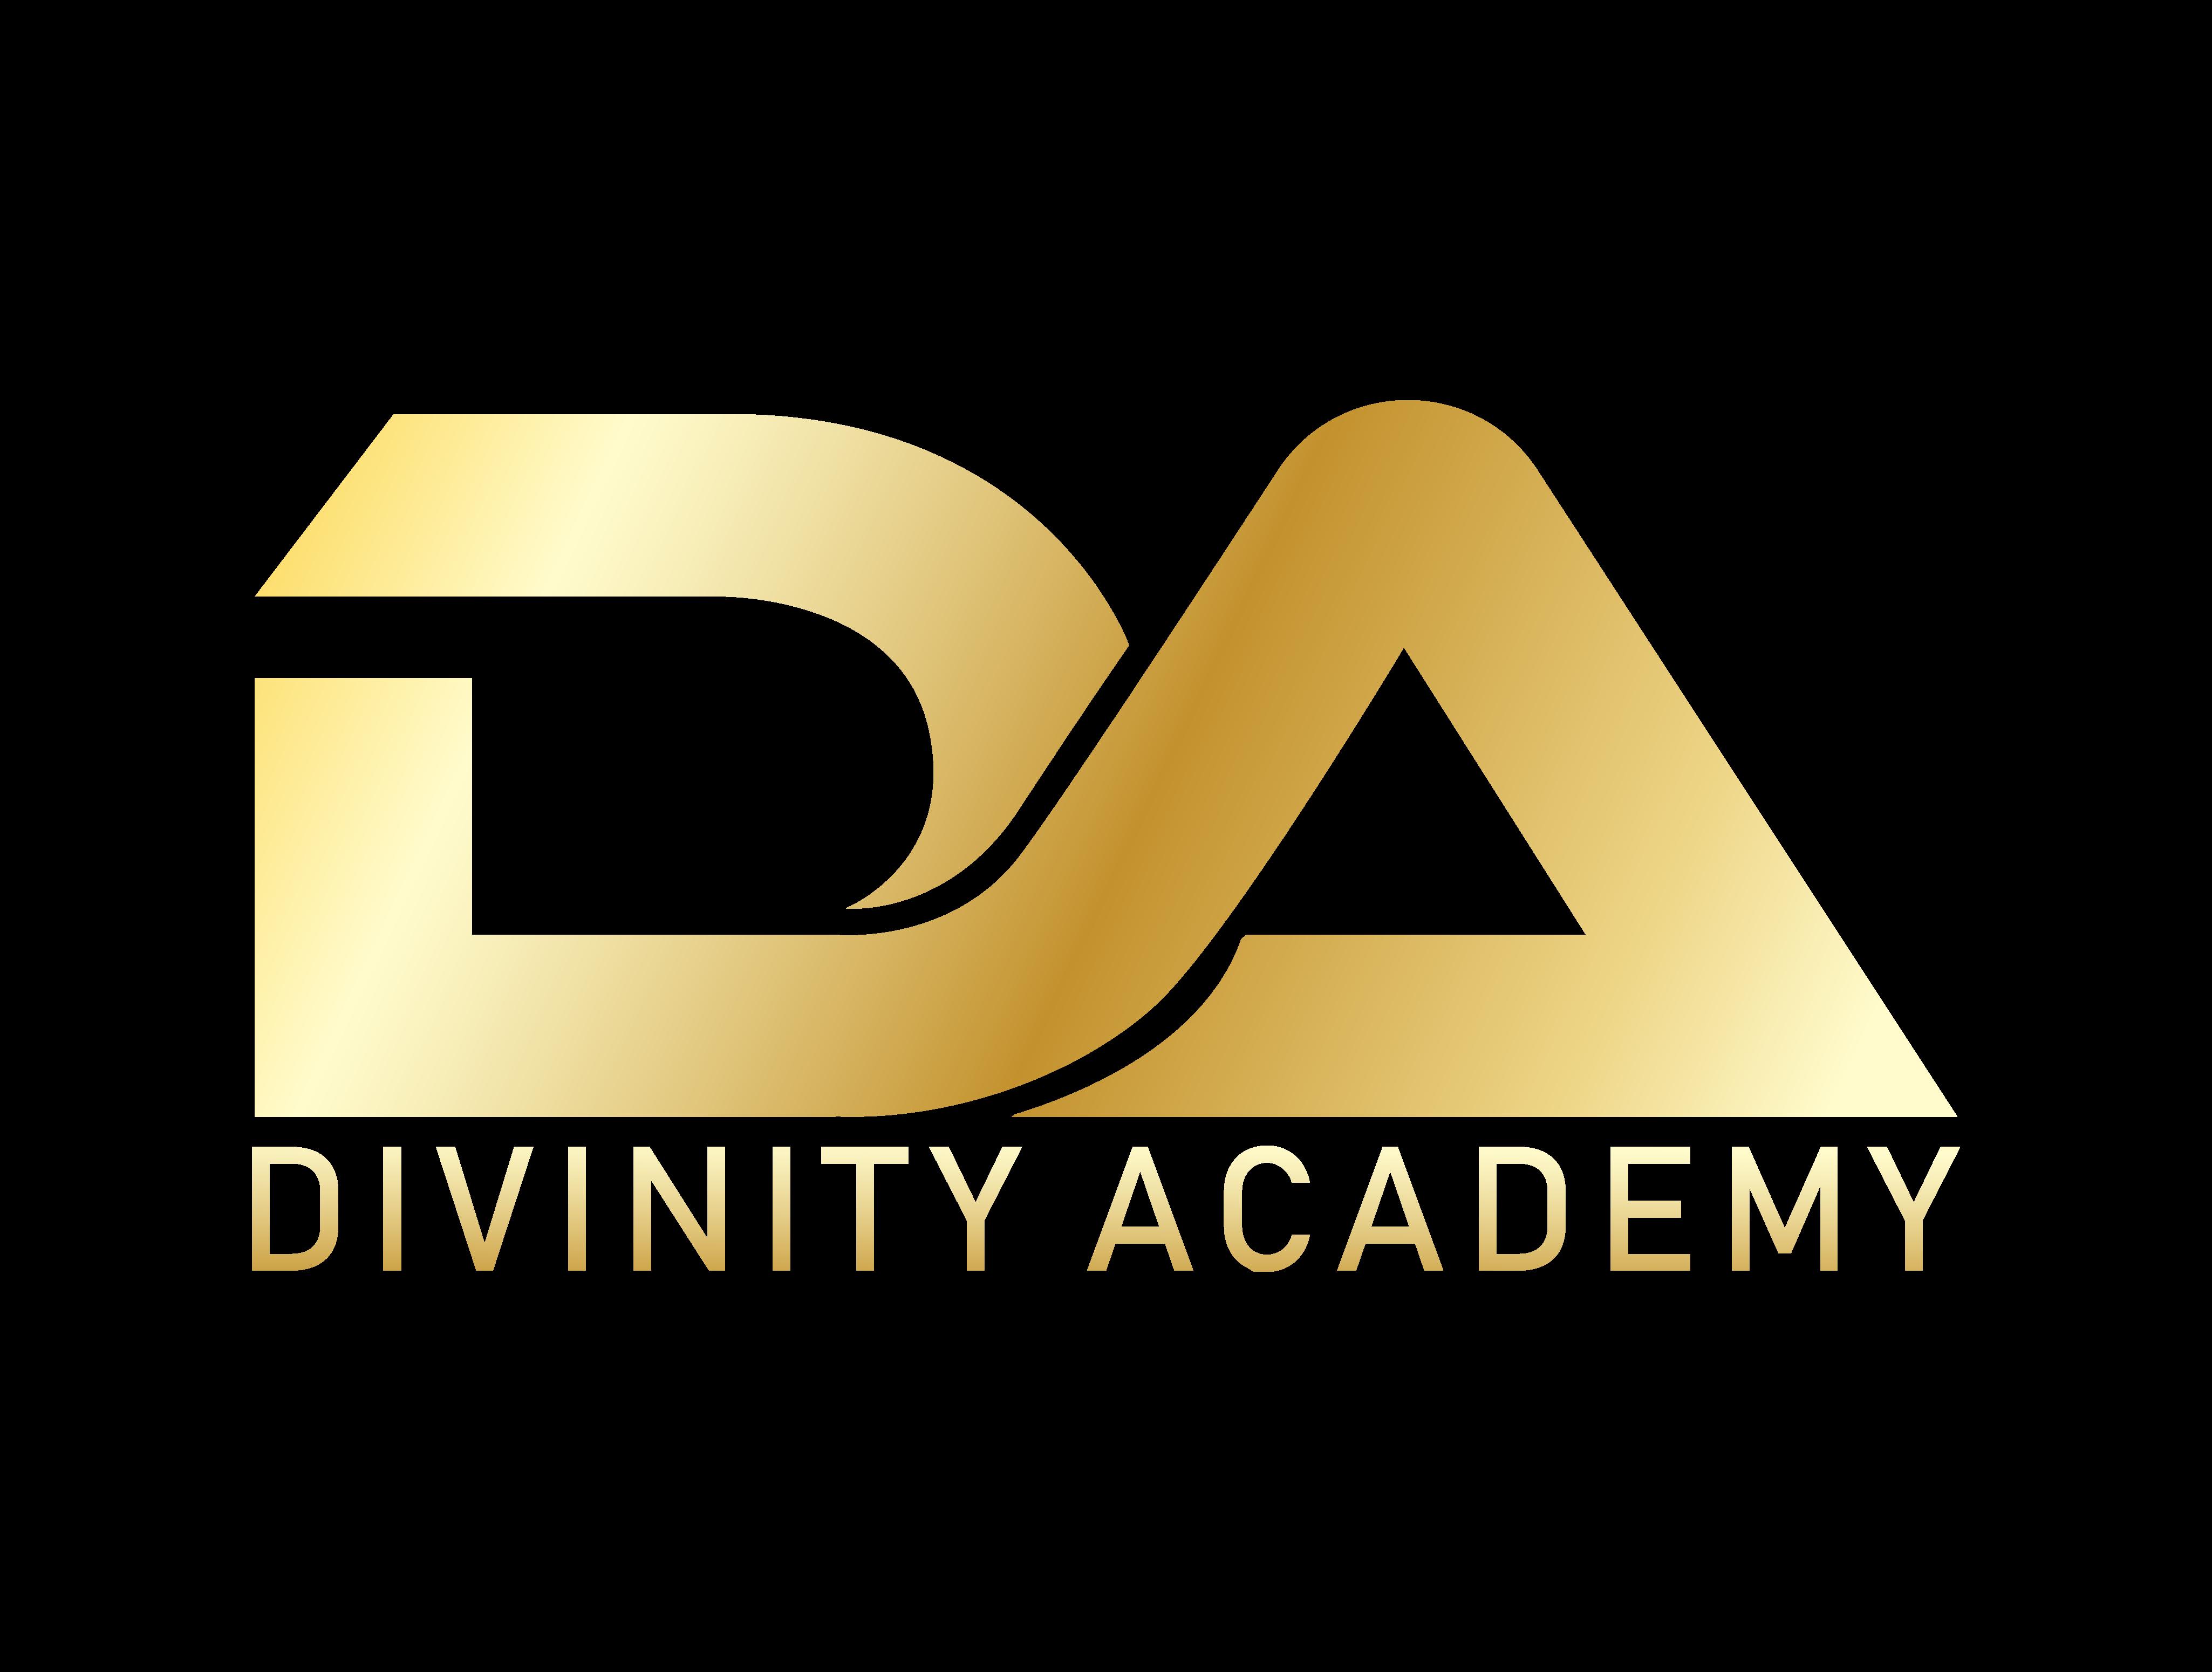 DivinityAcademy